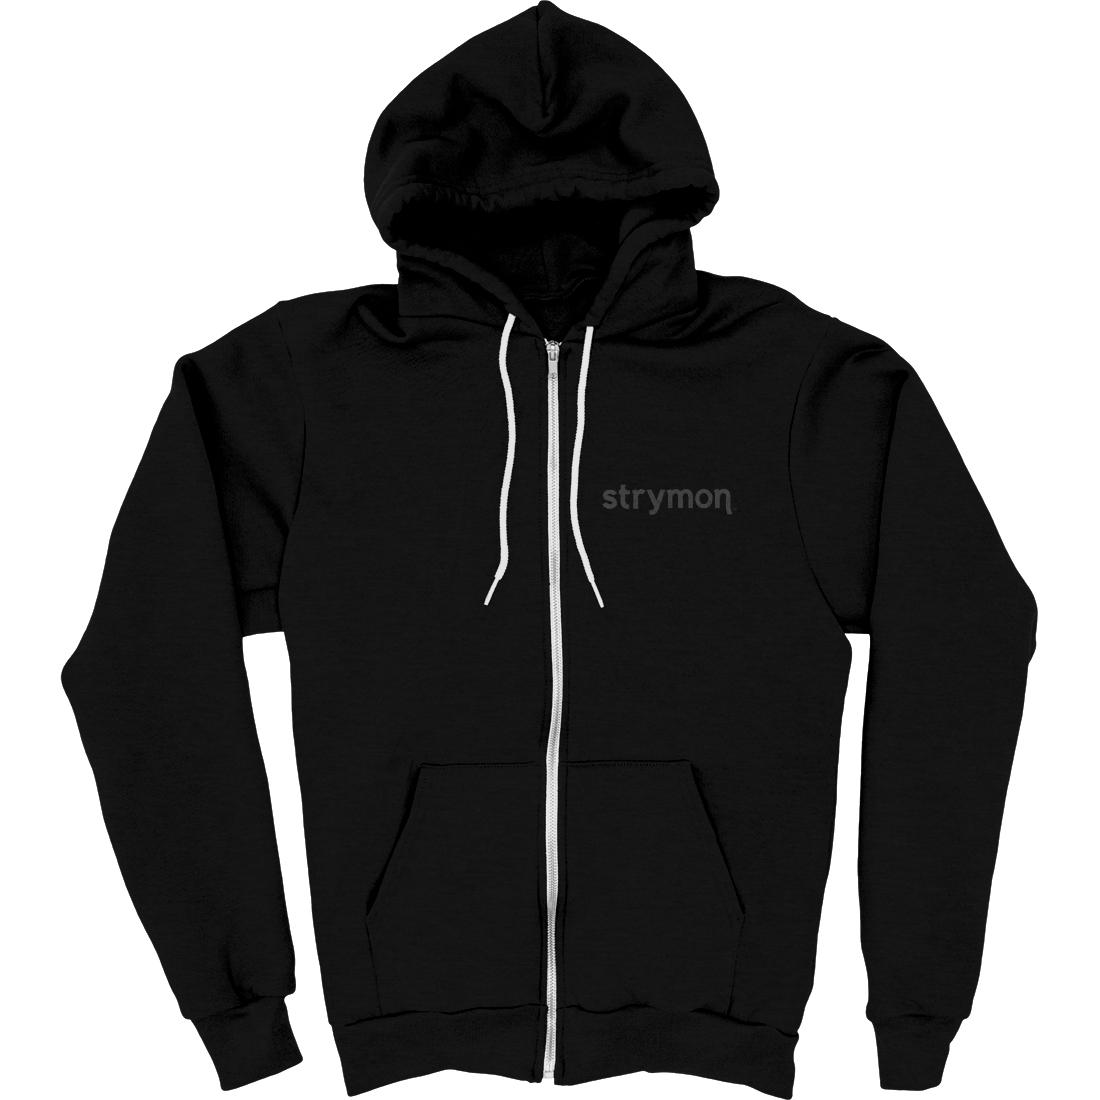 STRYMON USA [BLACK]